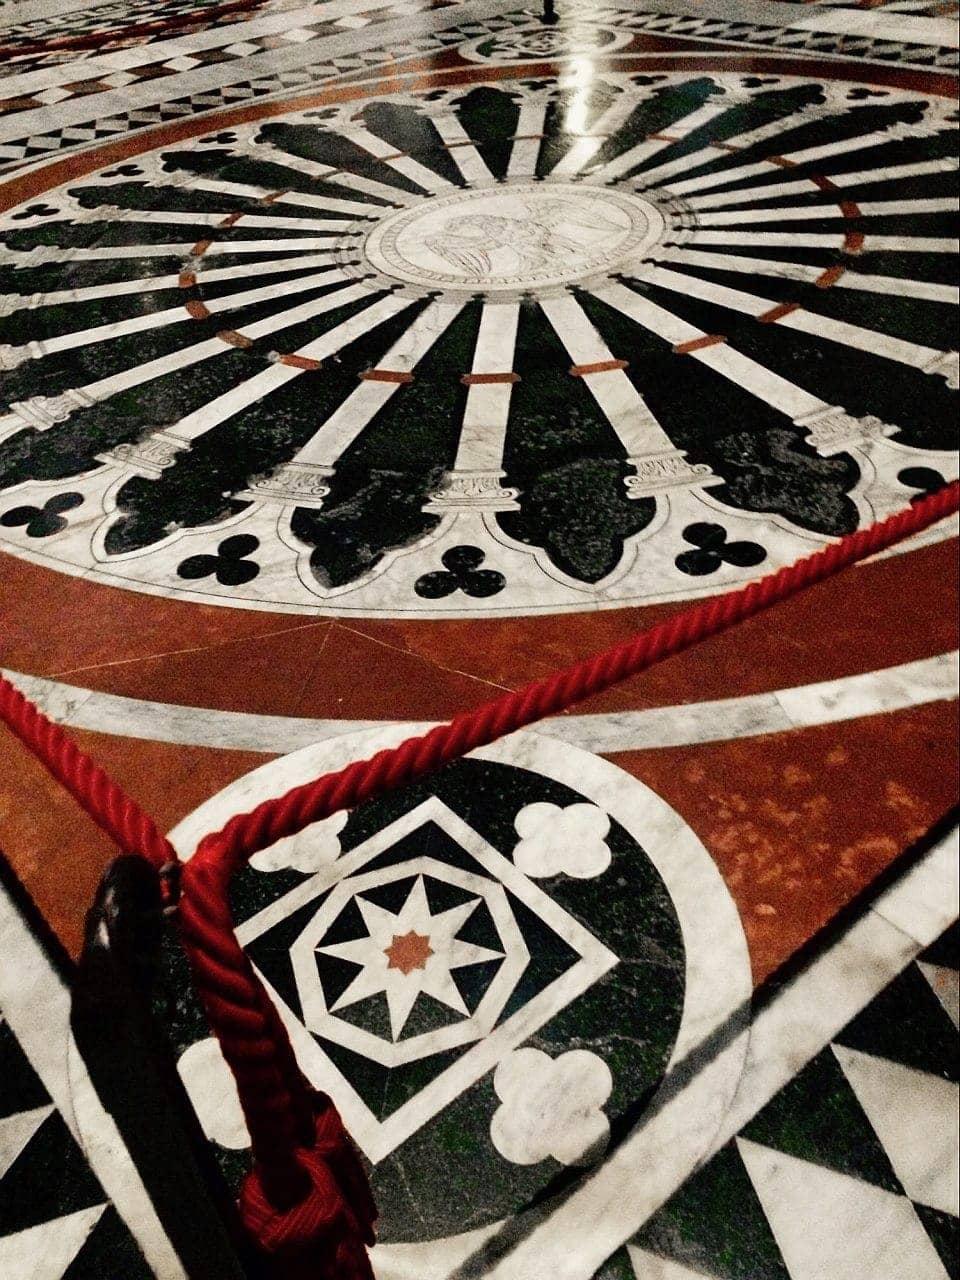 Duomo Siena, Aquila Imperiale sul pavimento